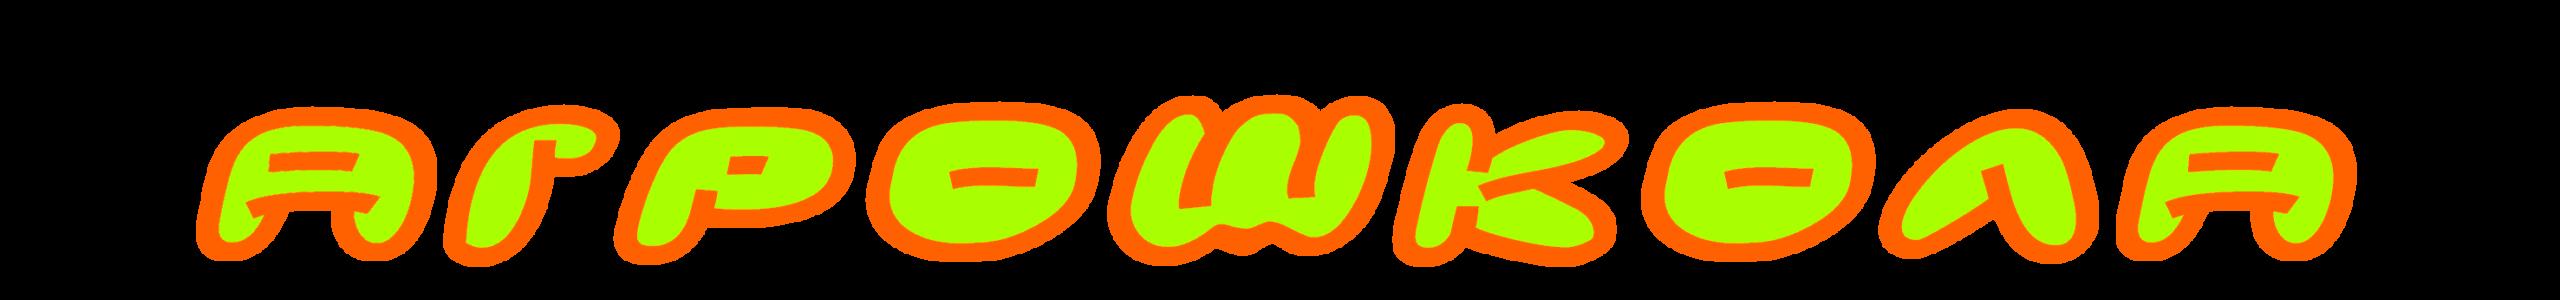 АГРОШКОЛА